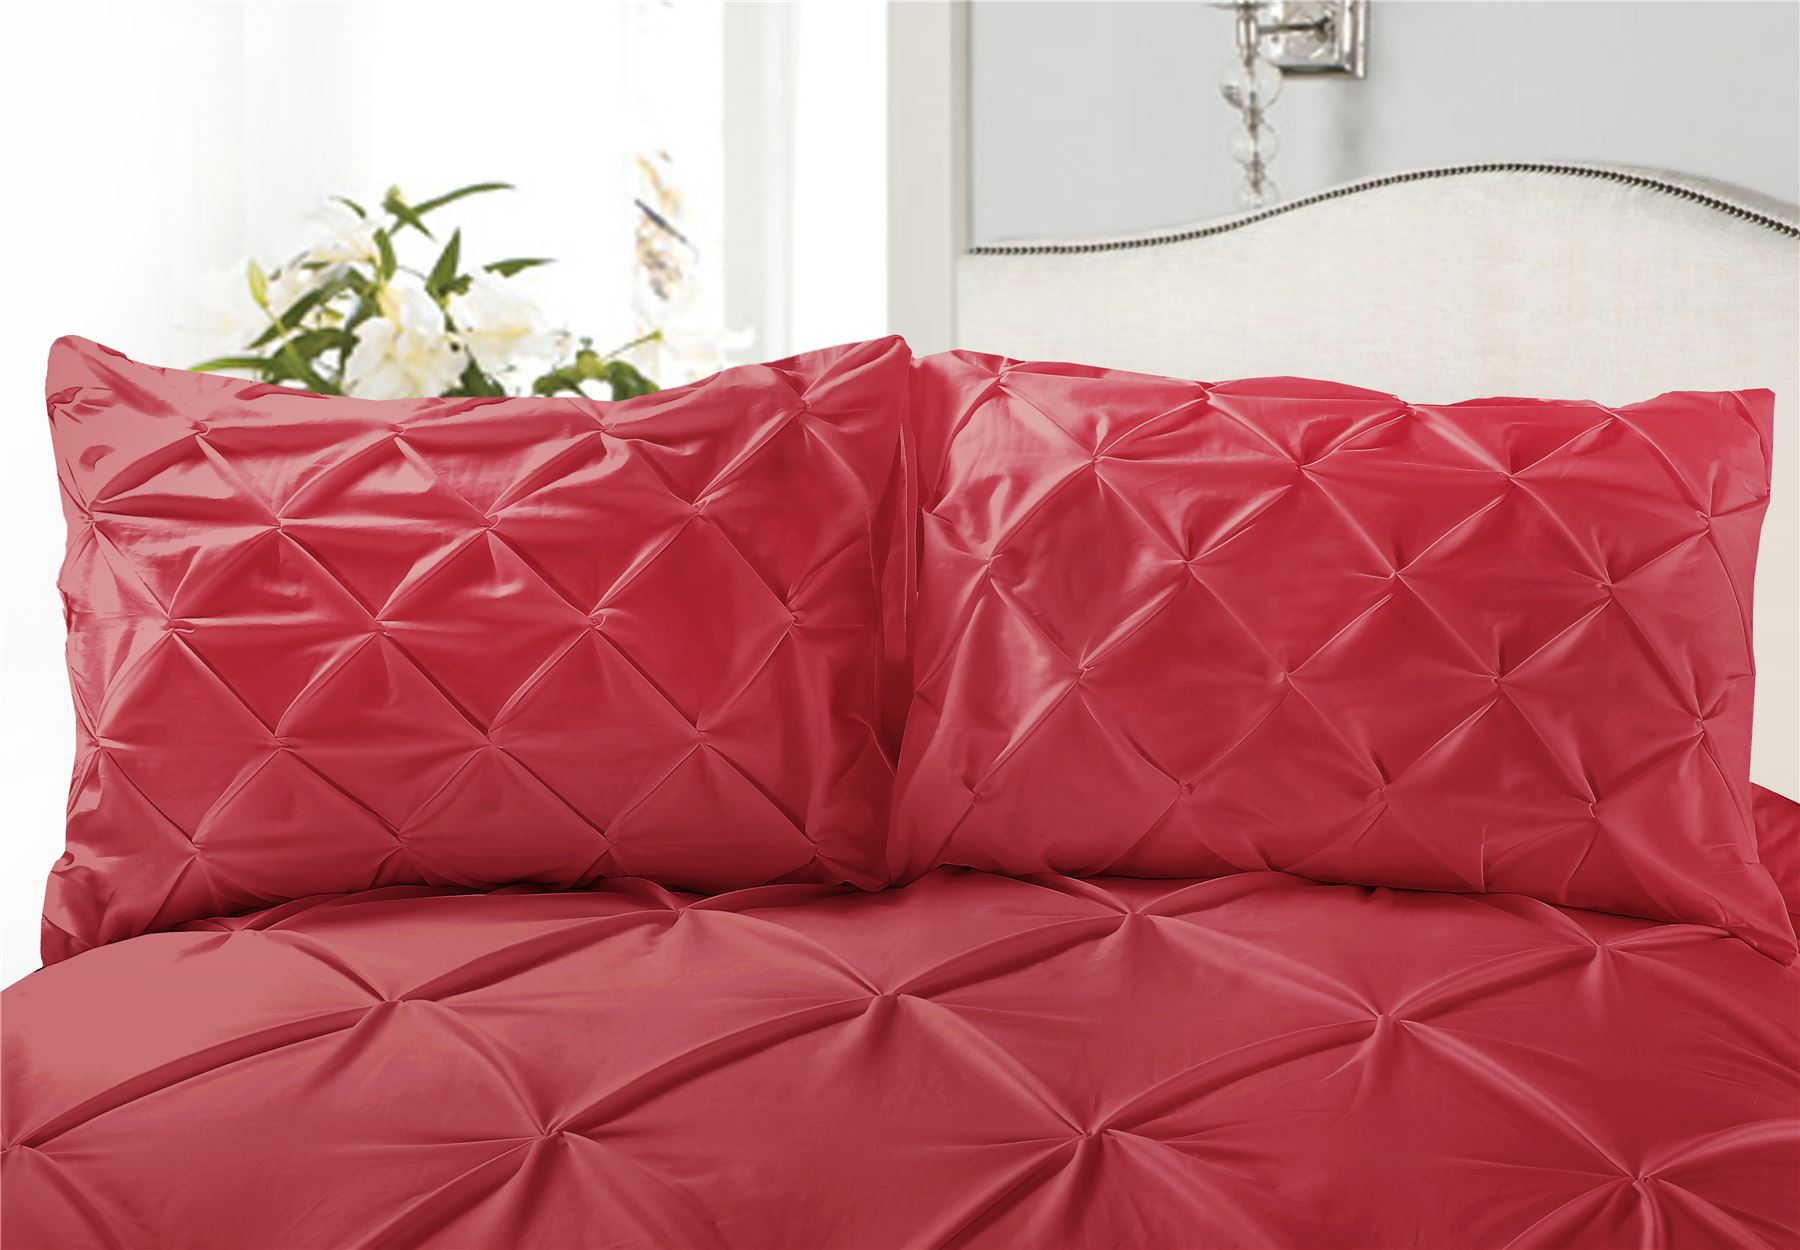 Luxury-Pure-100-Cotton-200-Thread-Pinch-Pleat-Pintuck-Puckering-Duvet-Cover-Set thumbnail 39